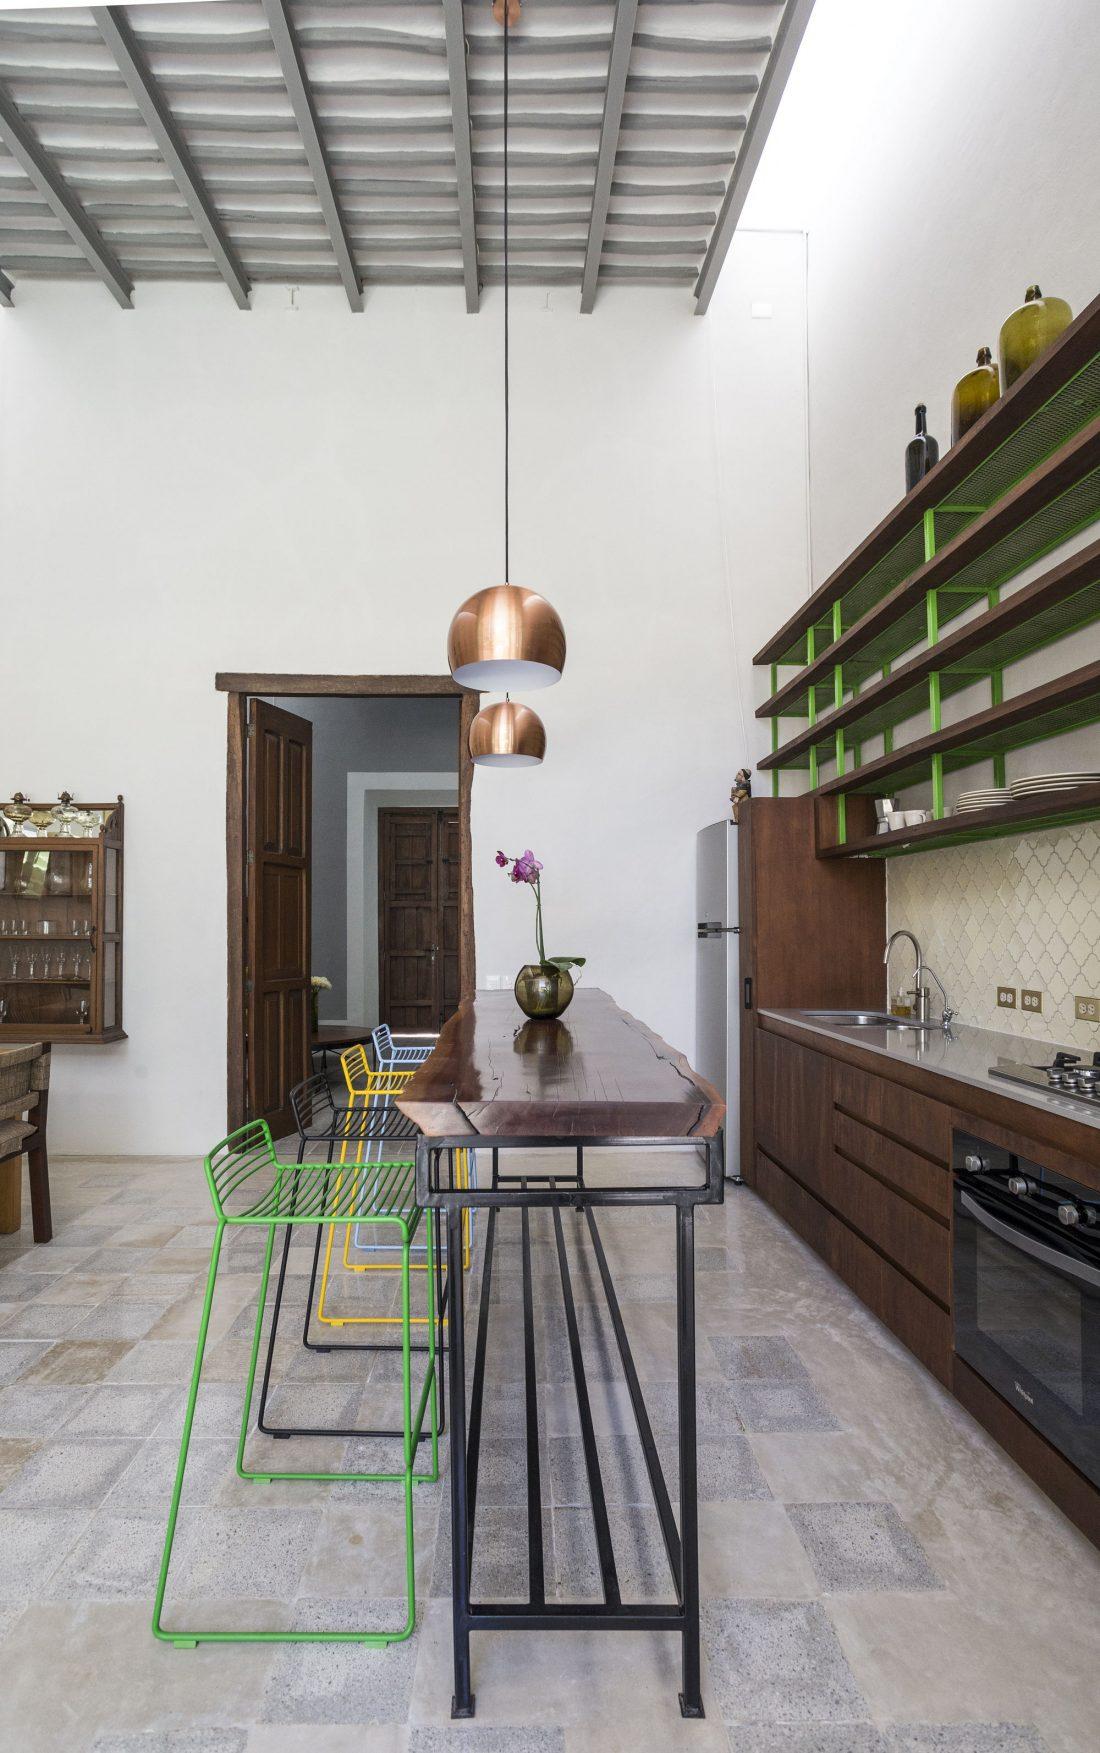 limonnyj-dom-v-meksike-fotografii-interera-12